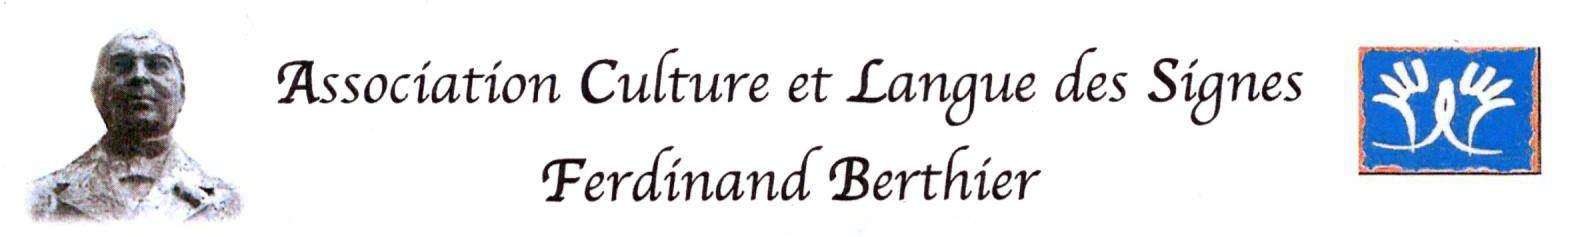 Association Ferdinand Berthier